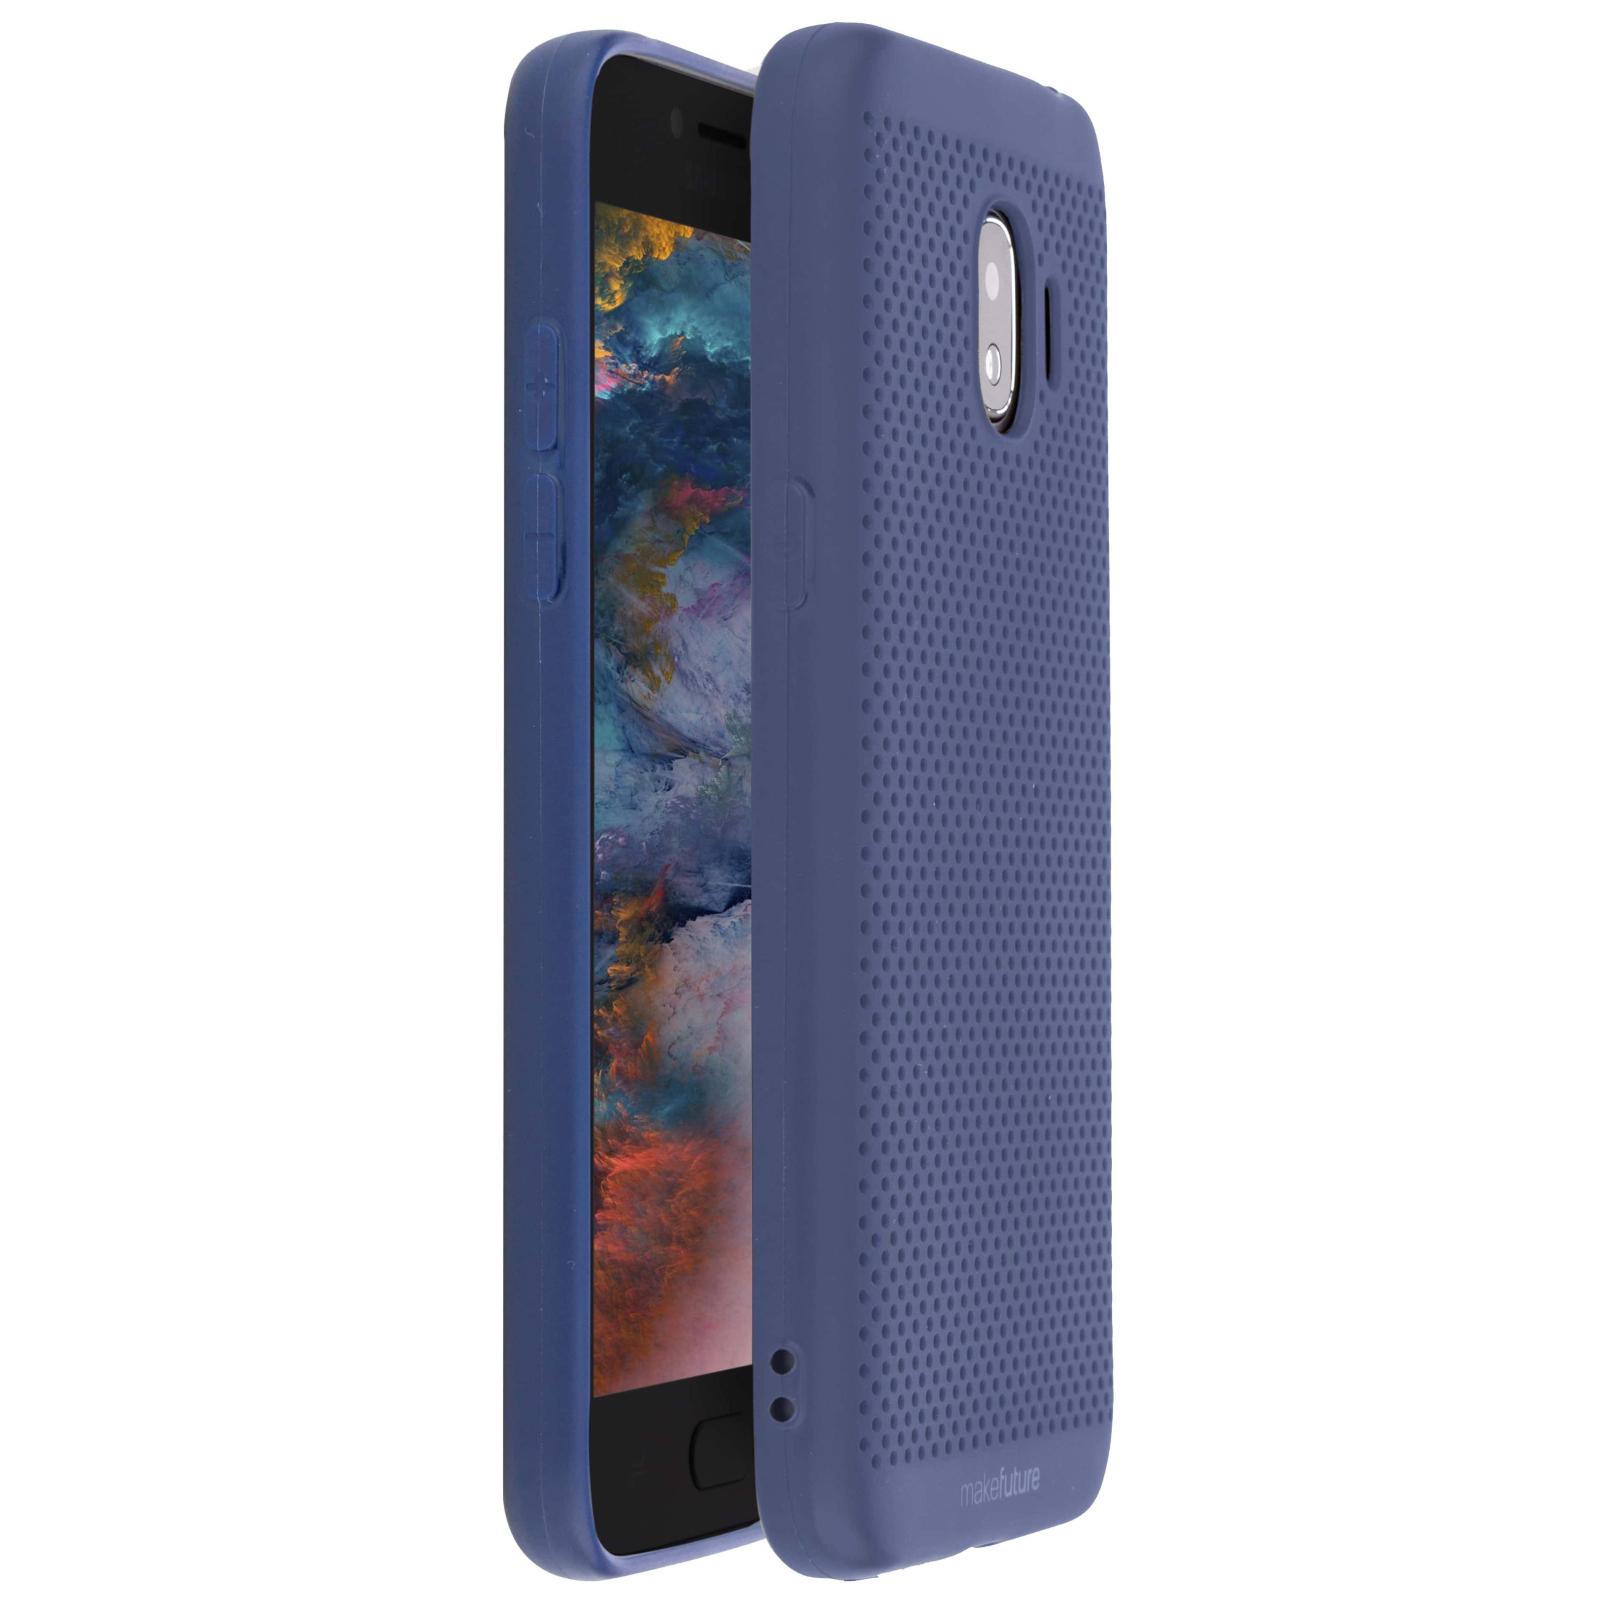 Чехол для моб. телефона MakeFuture Moon Case (TPU) для Samsung J2 2018 (J250) Blue (MCM-SJ250BL) изображение 2